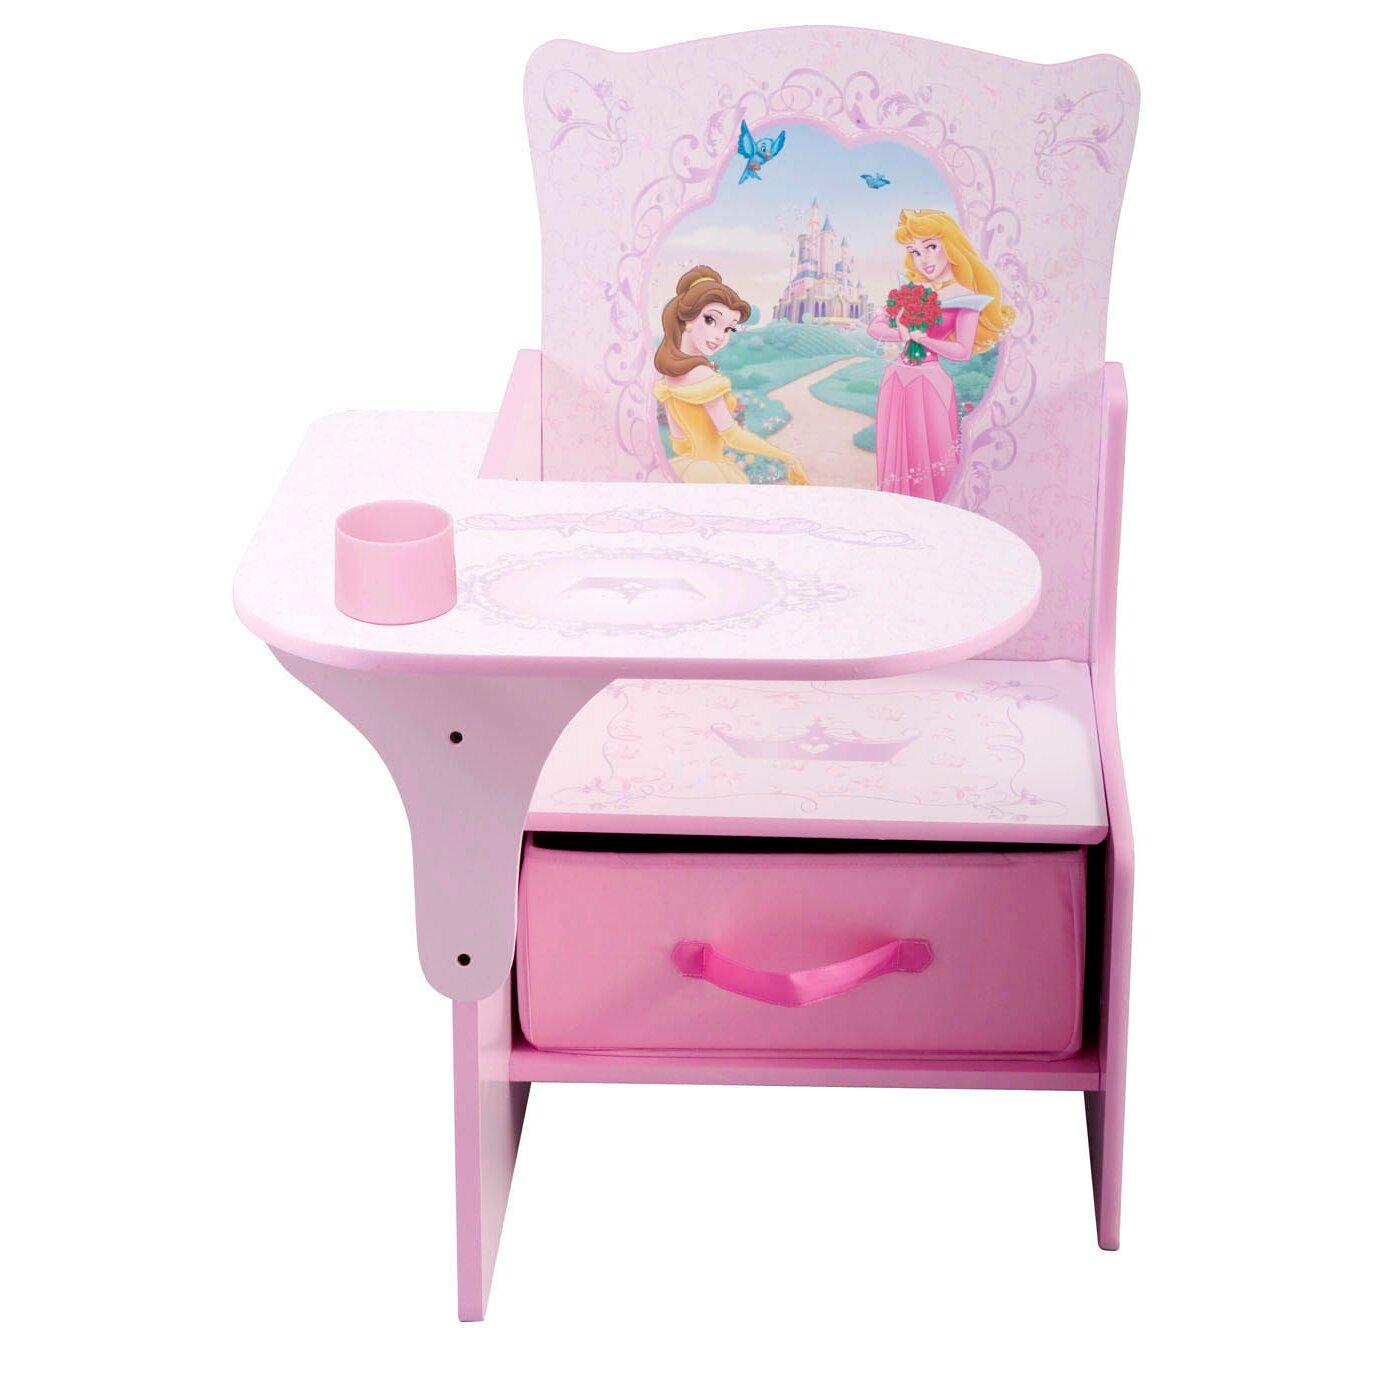 Novelty Bedroom Bin